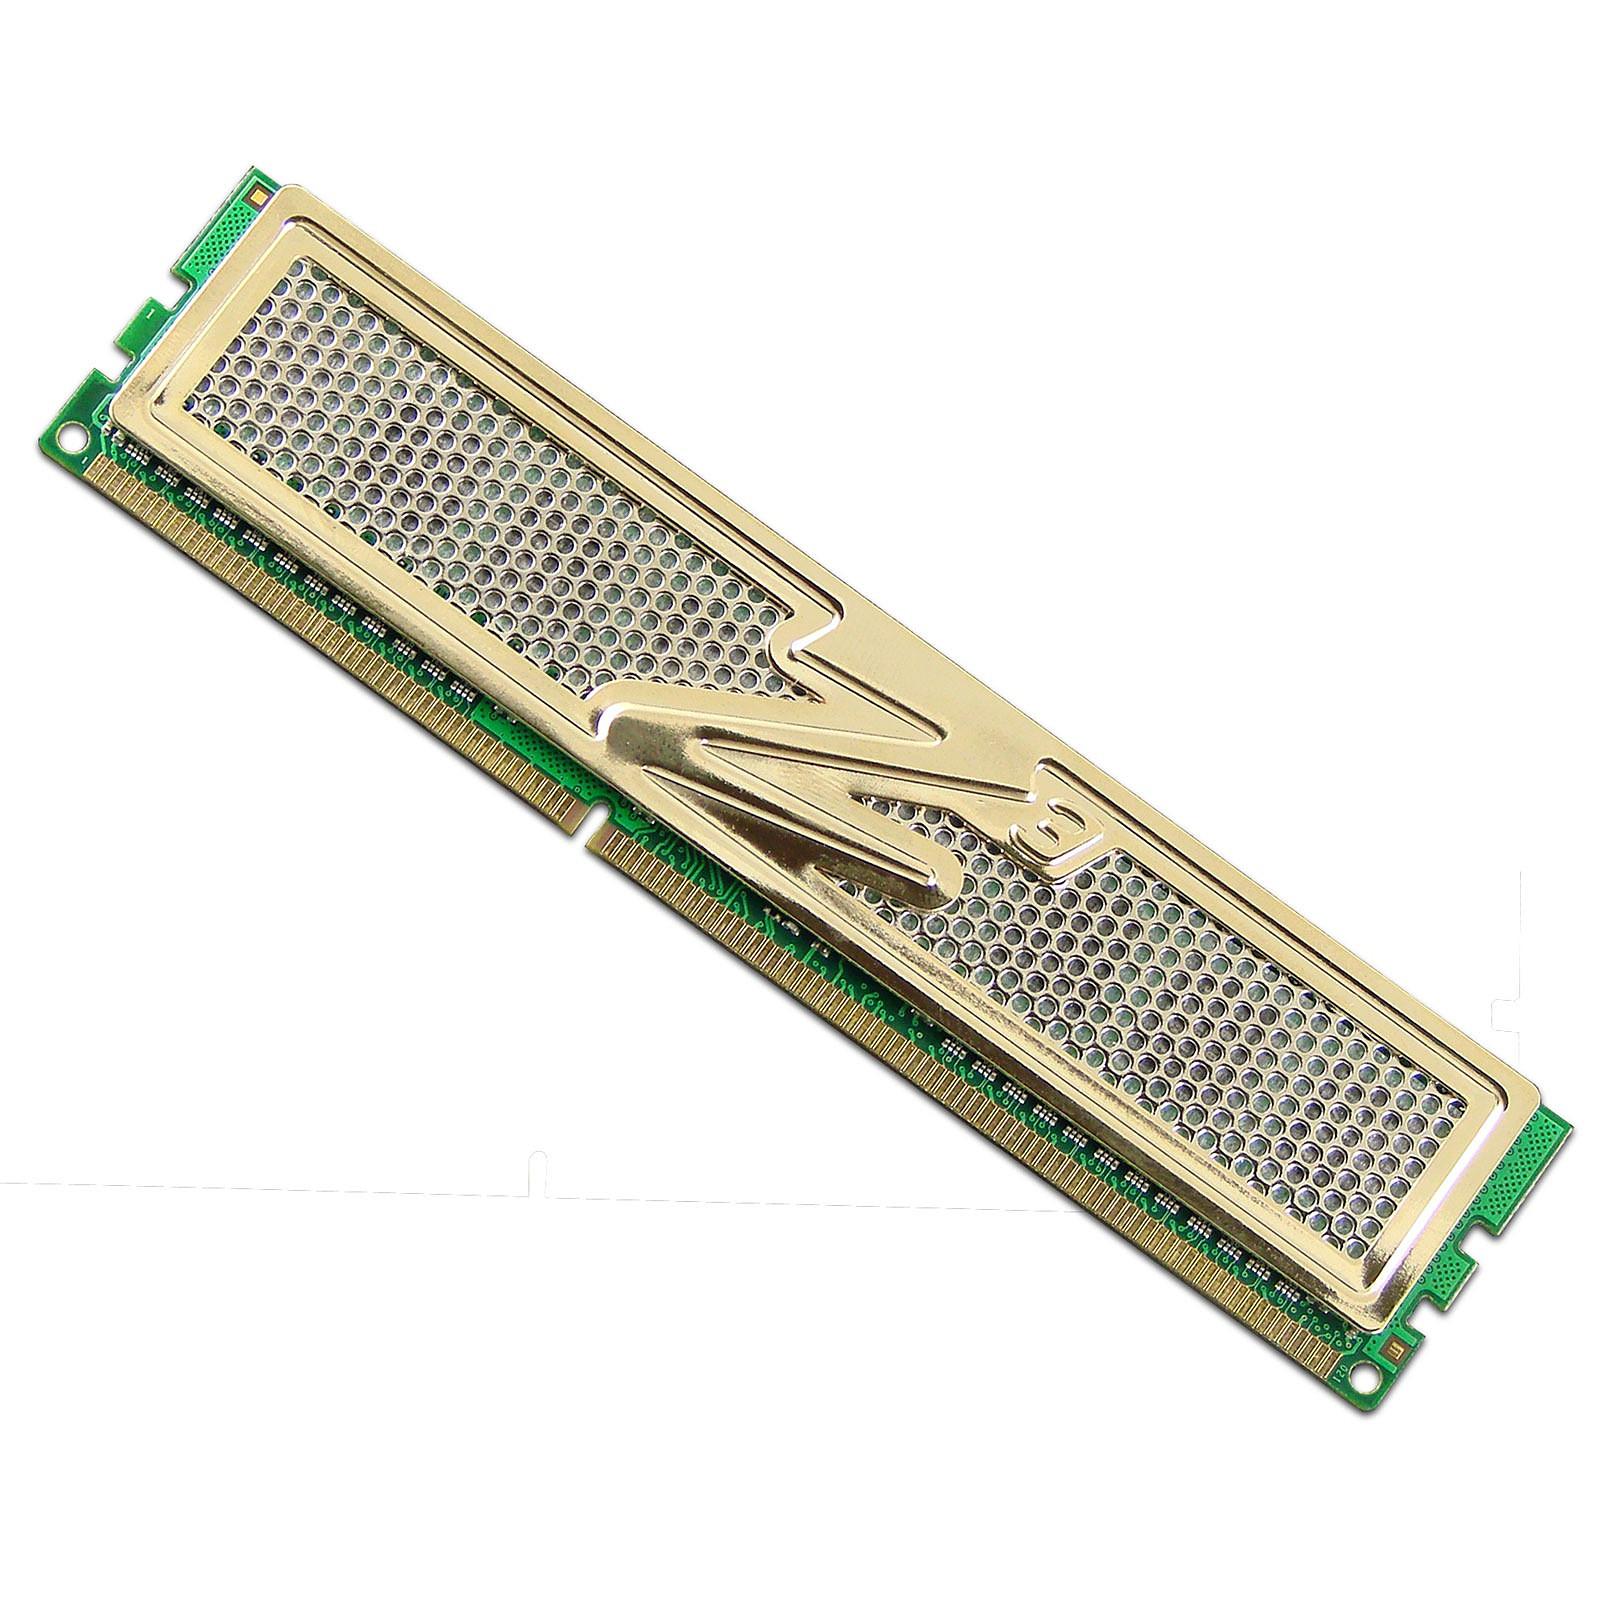 OCZ Gold Edition 4 Go DDR3 1333 MHz